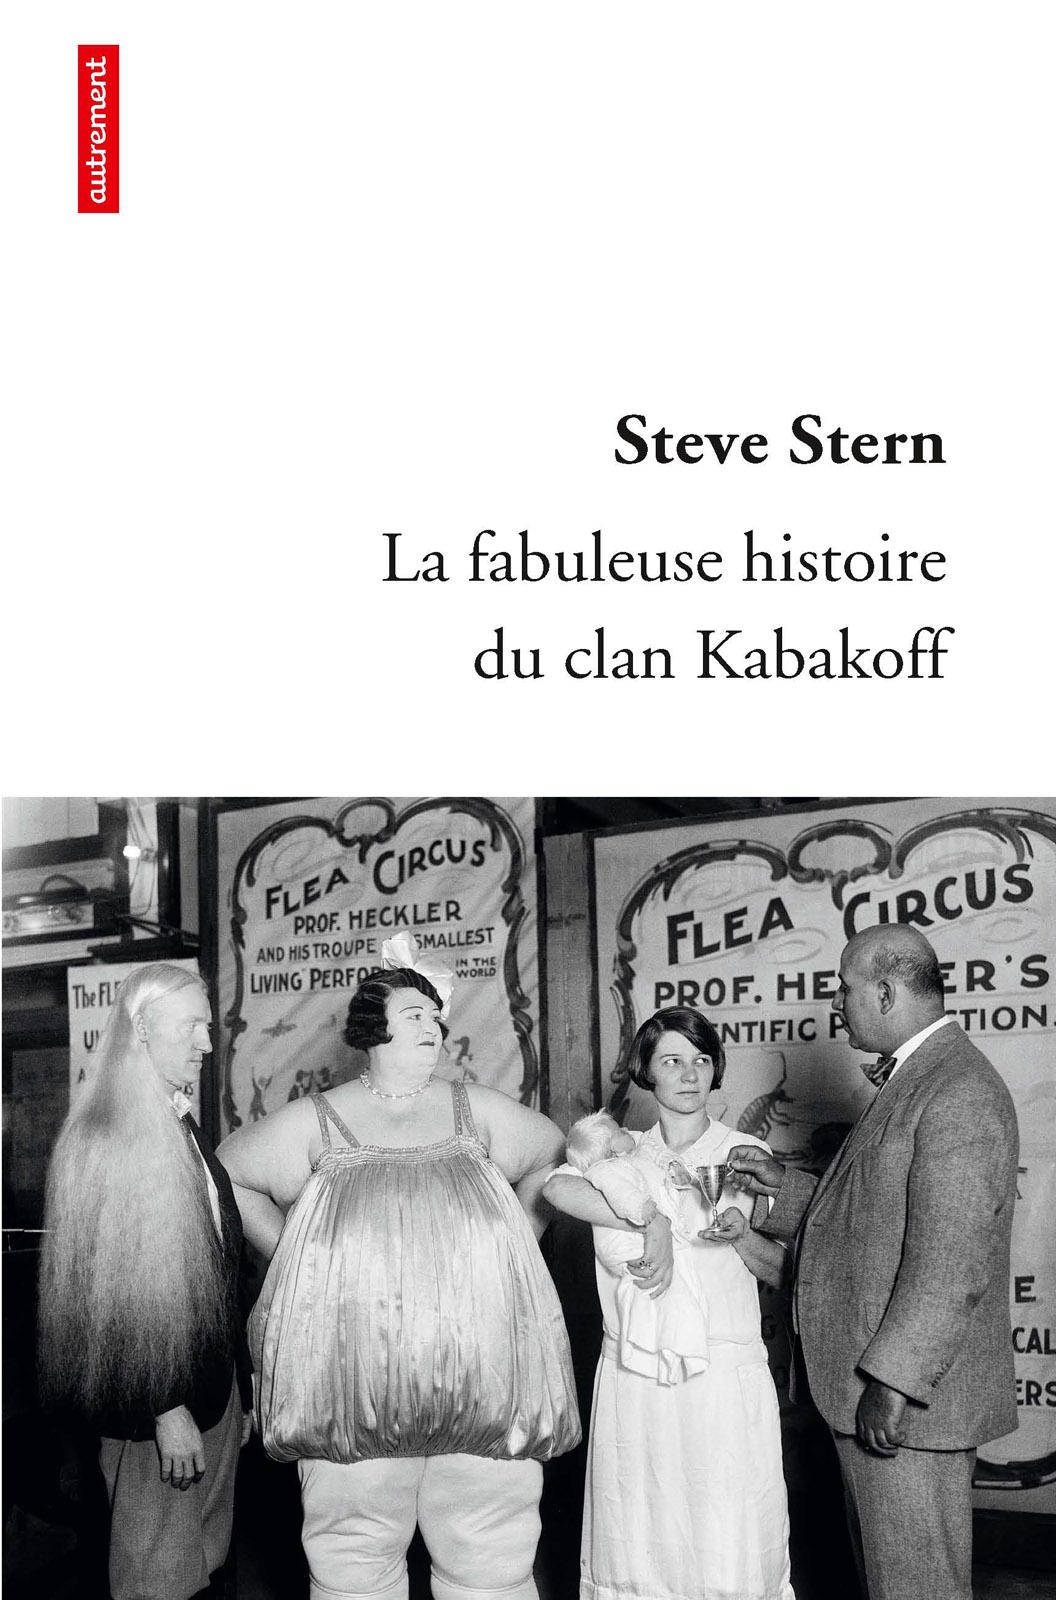 La Fabuleuse Histoire du clan Kabakoff